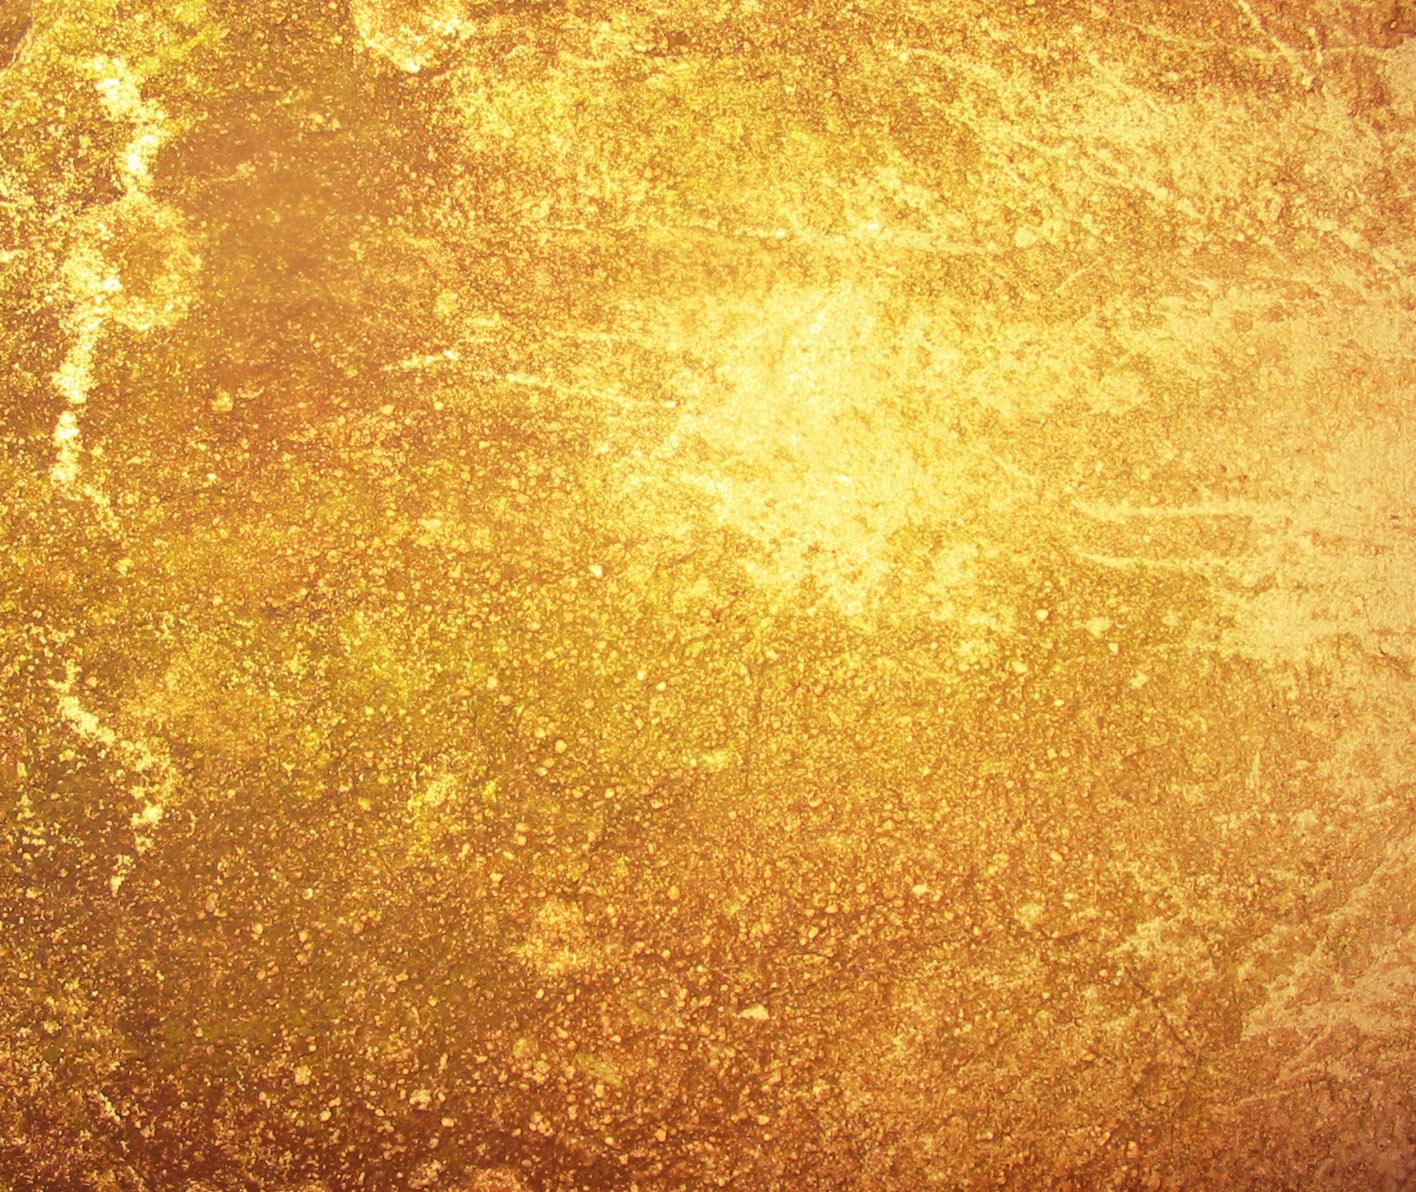 sun texture map nasa - photo #16